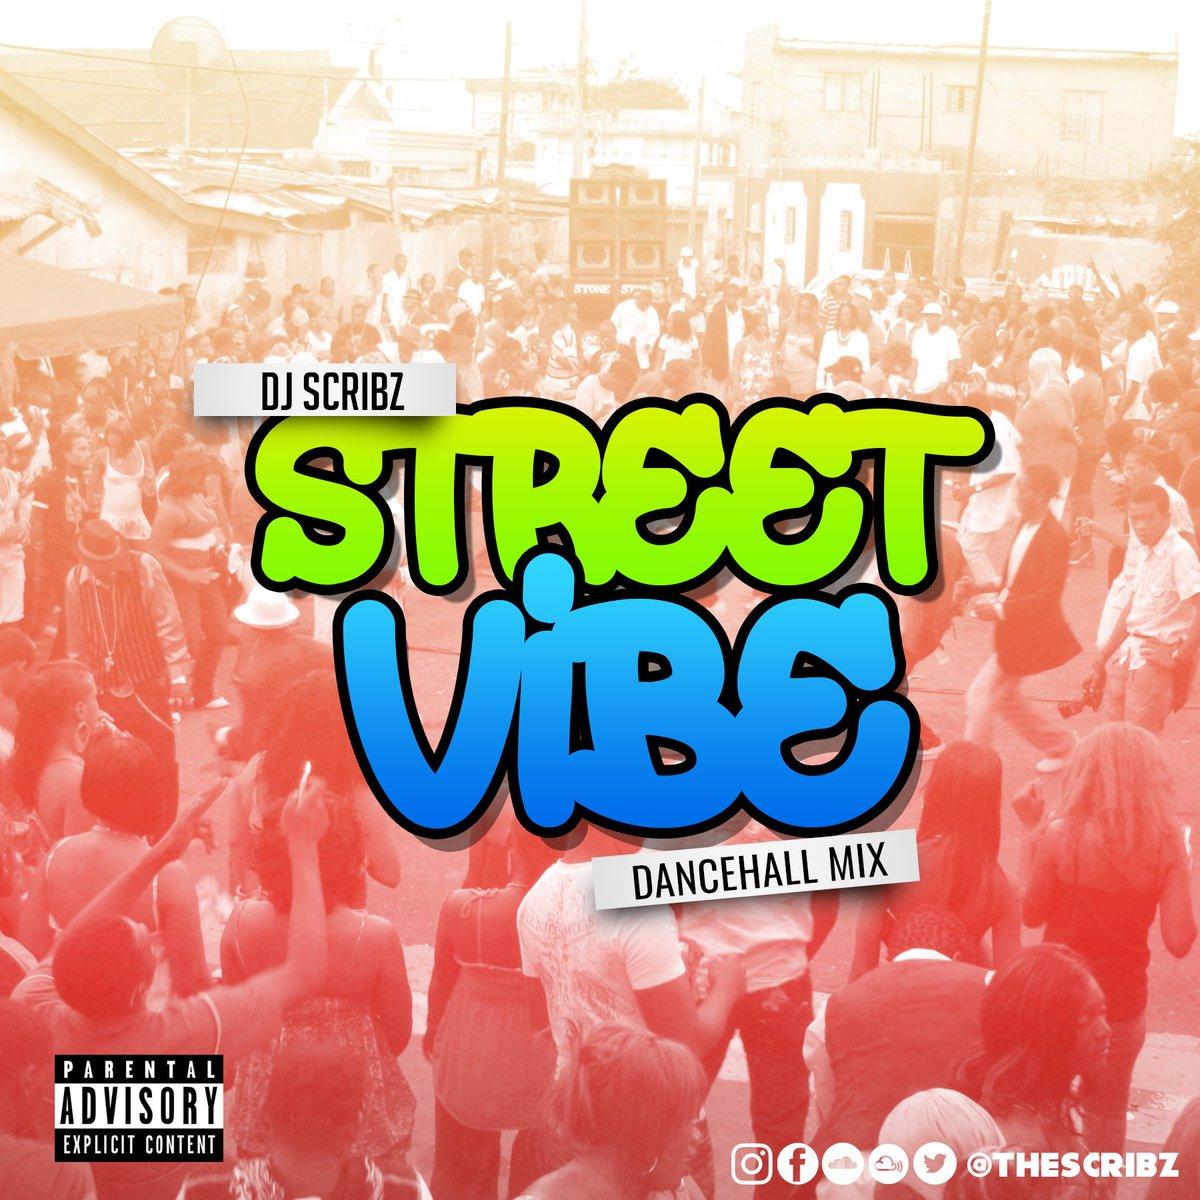 Dj Scribz presents Street Vibe  One Track - https://t.co/eNvRebvl08 Tracked - https://t.co/T9jgYycaws https://t.co/NStjsFWJ6C